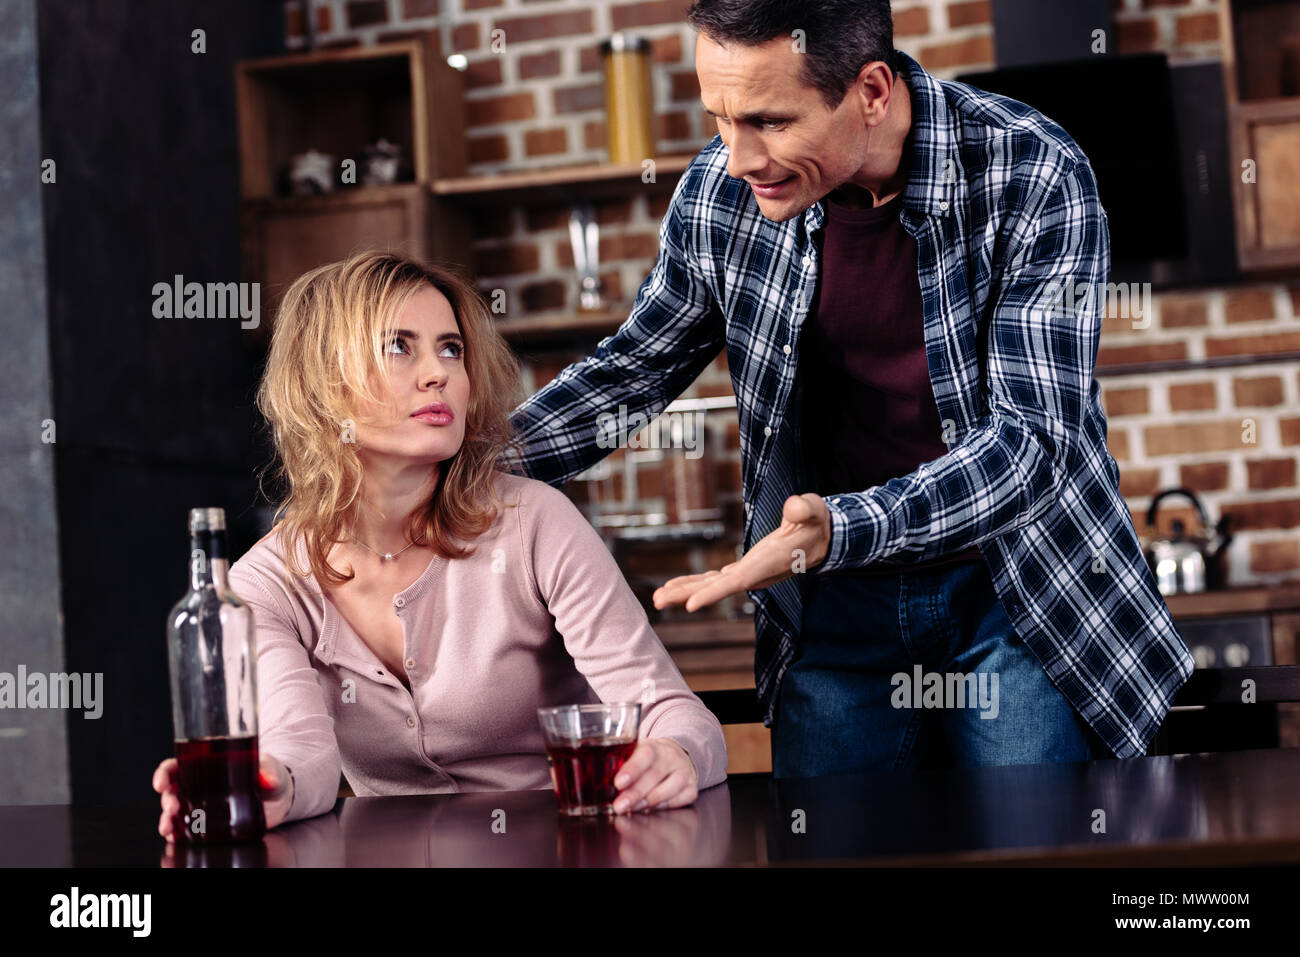 Dating a drunkard